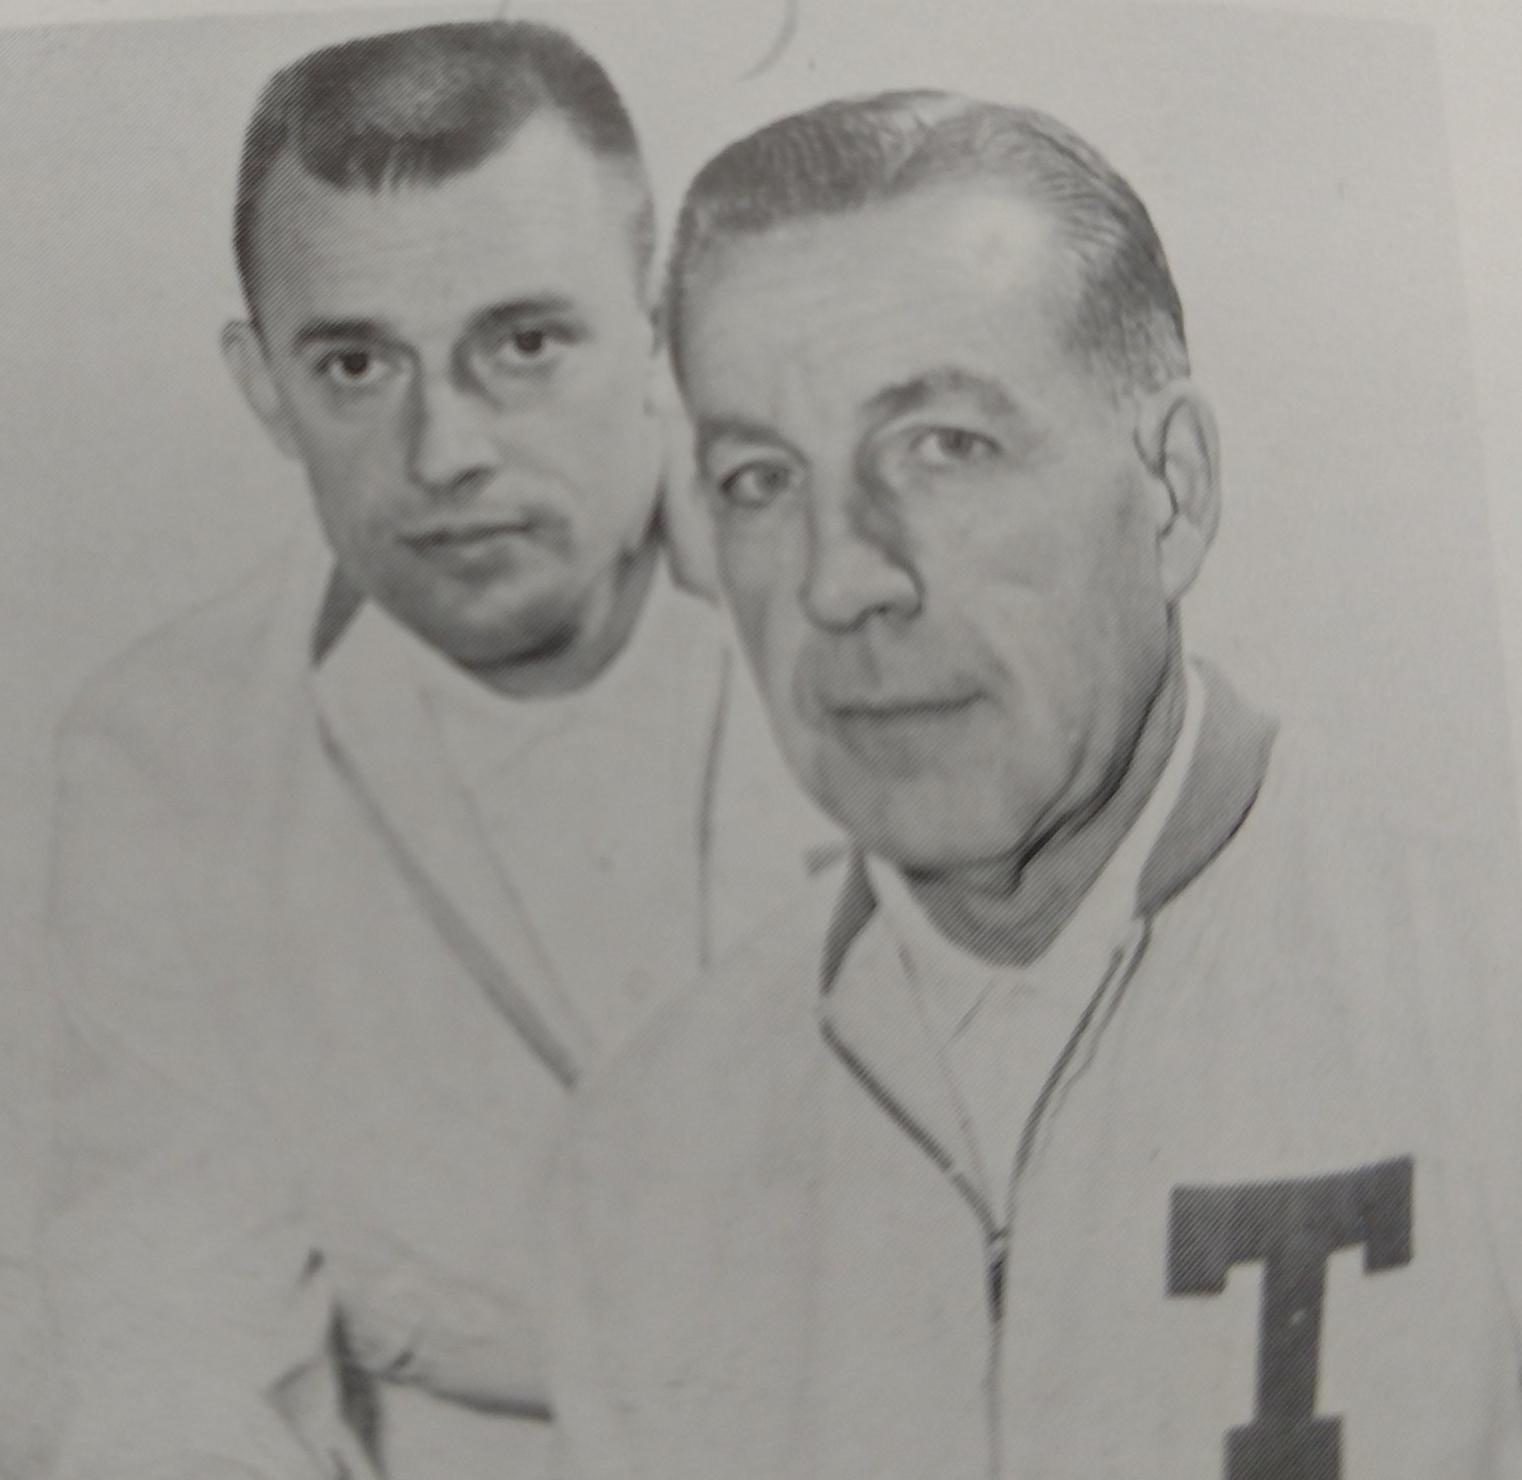 Coach Black and Bradley